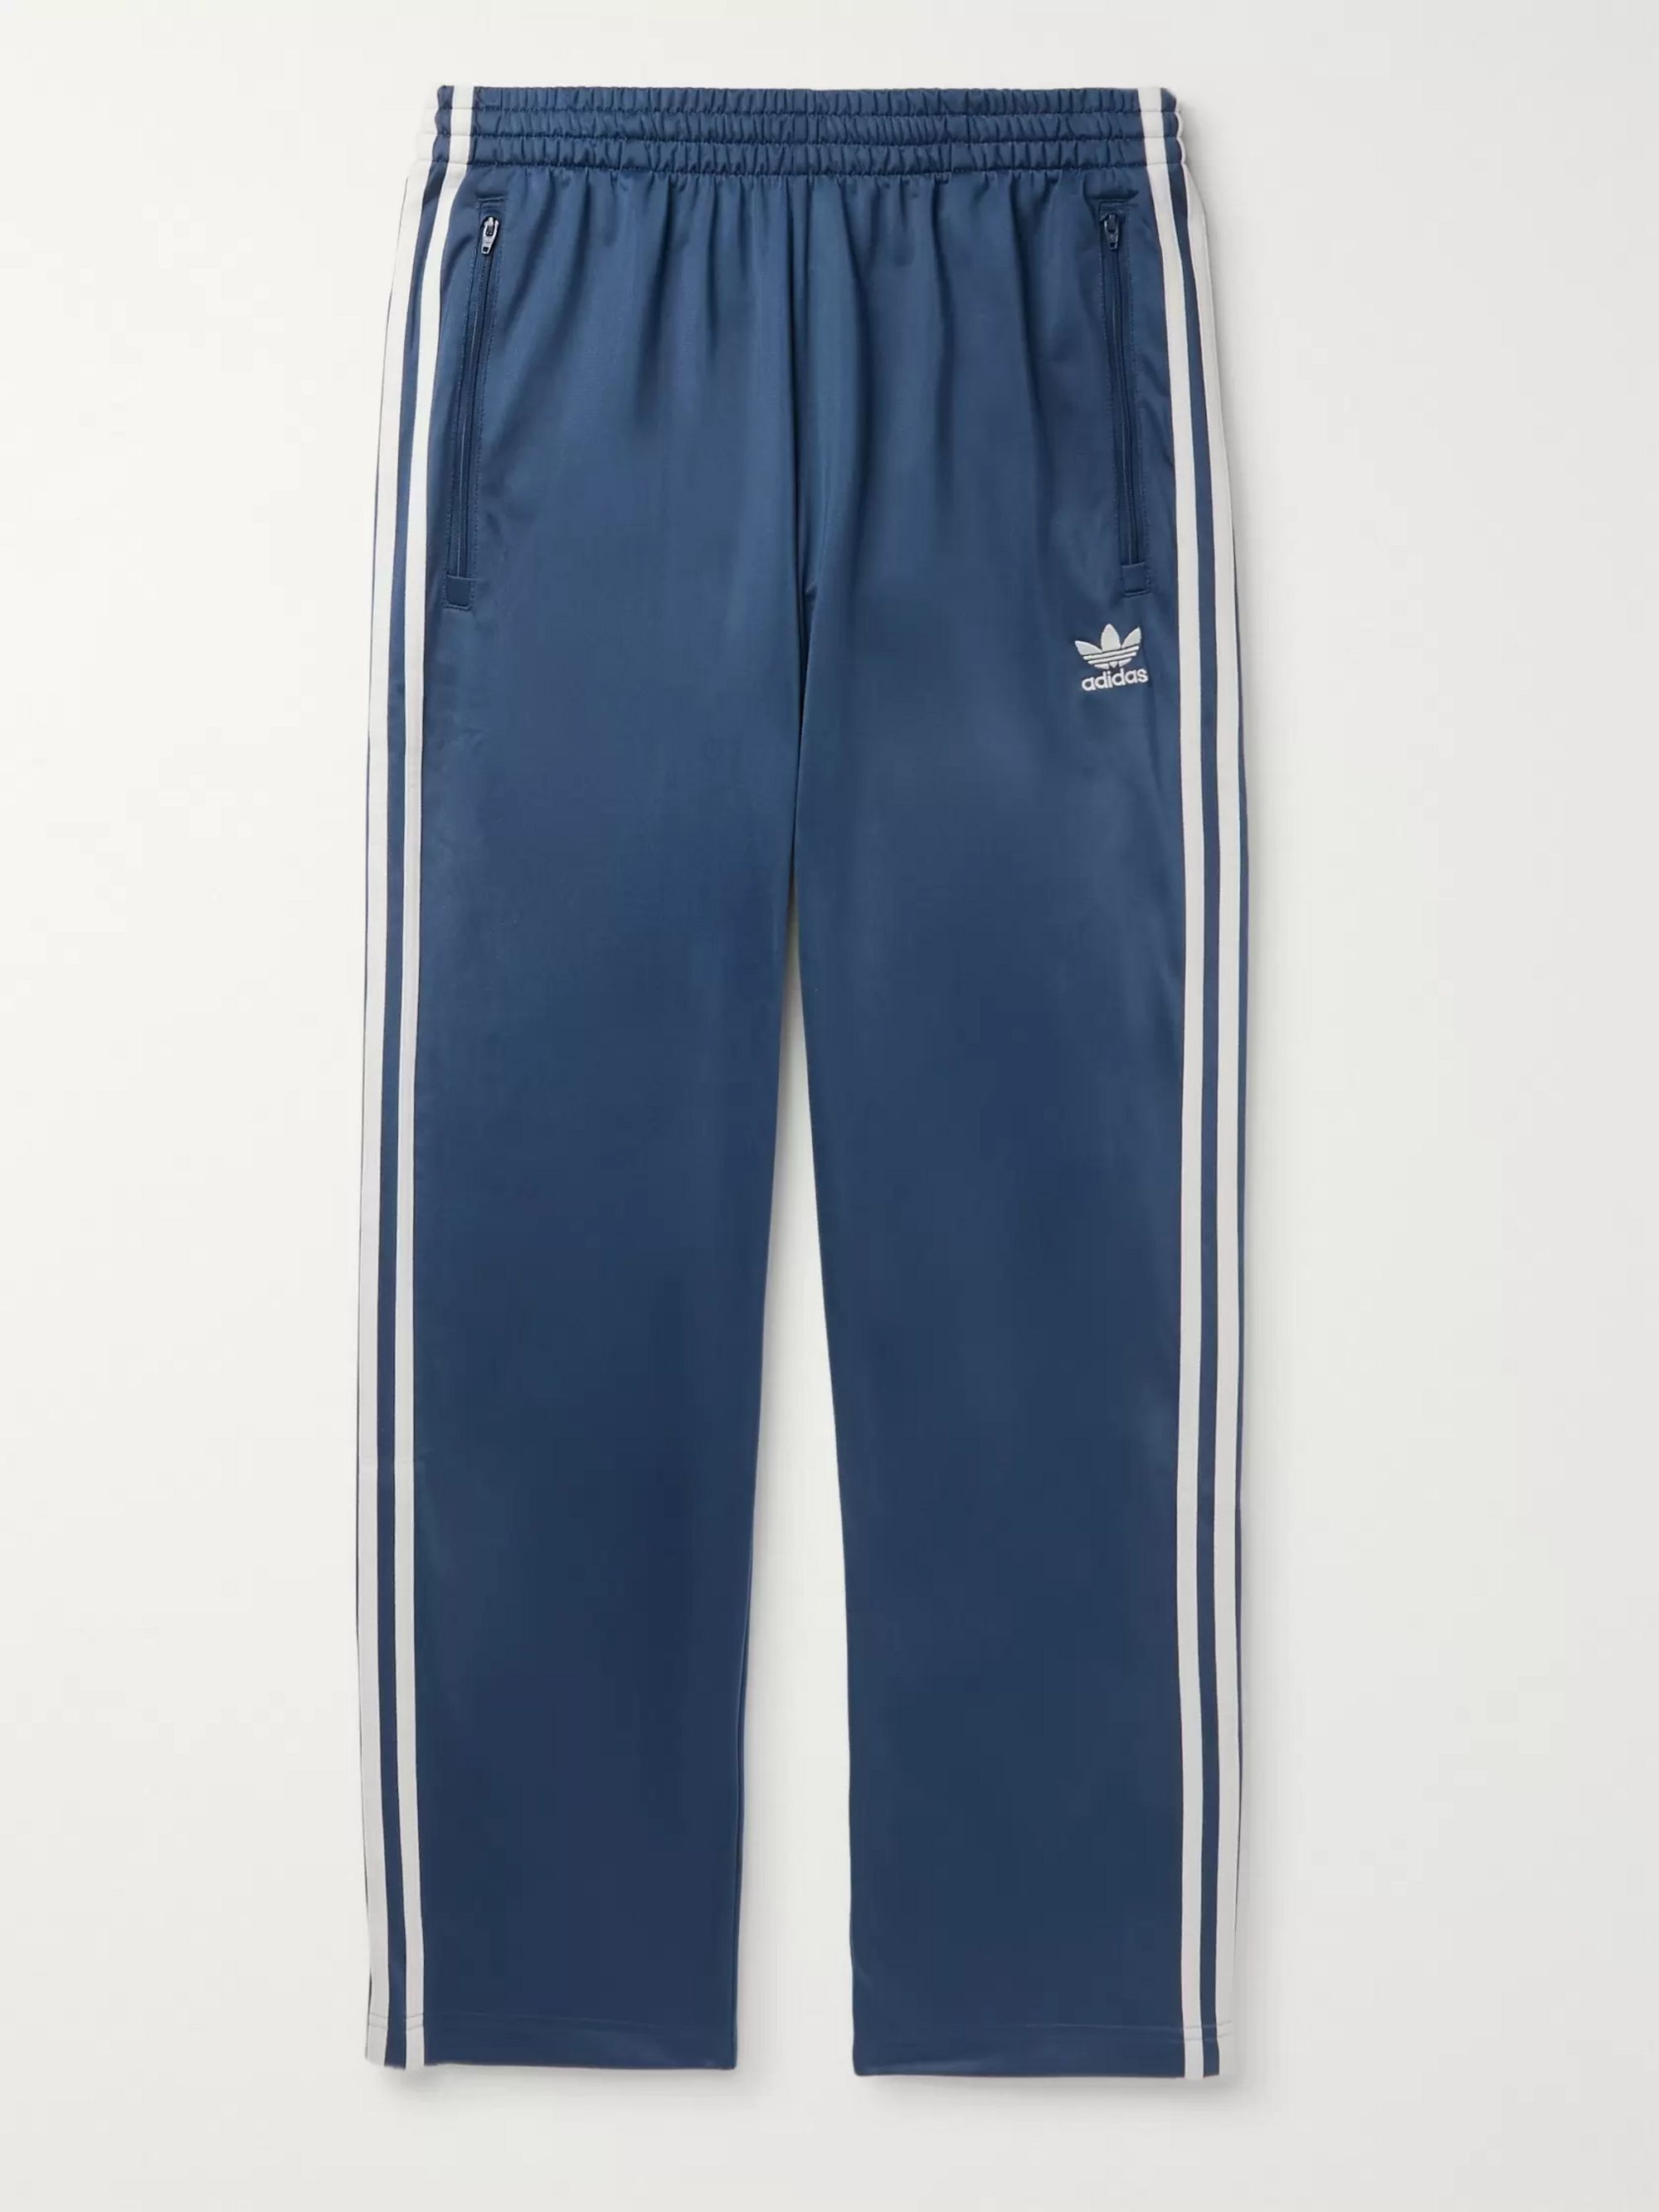 track pants firebird adidas donna